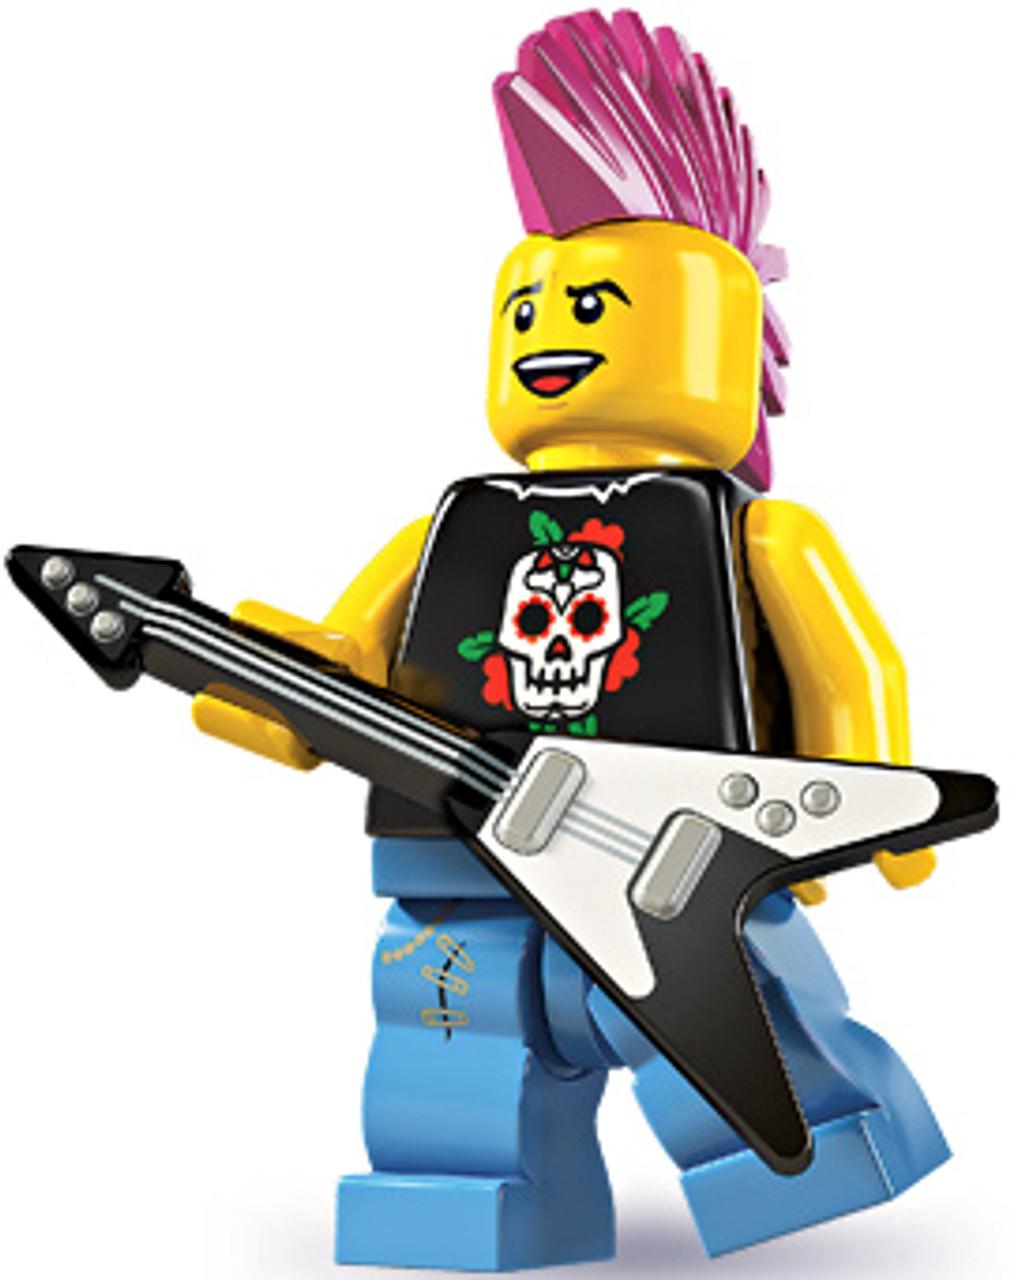 LEGO Minifigures Series 4 Punk Rocker Minifigure [Loose]